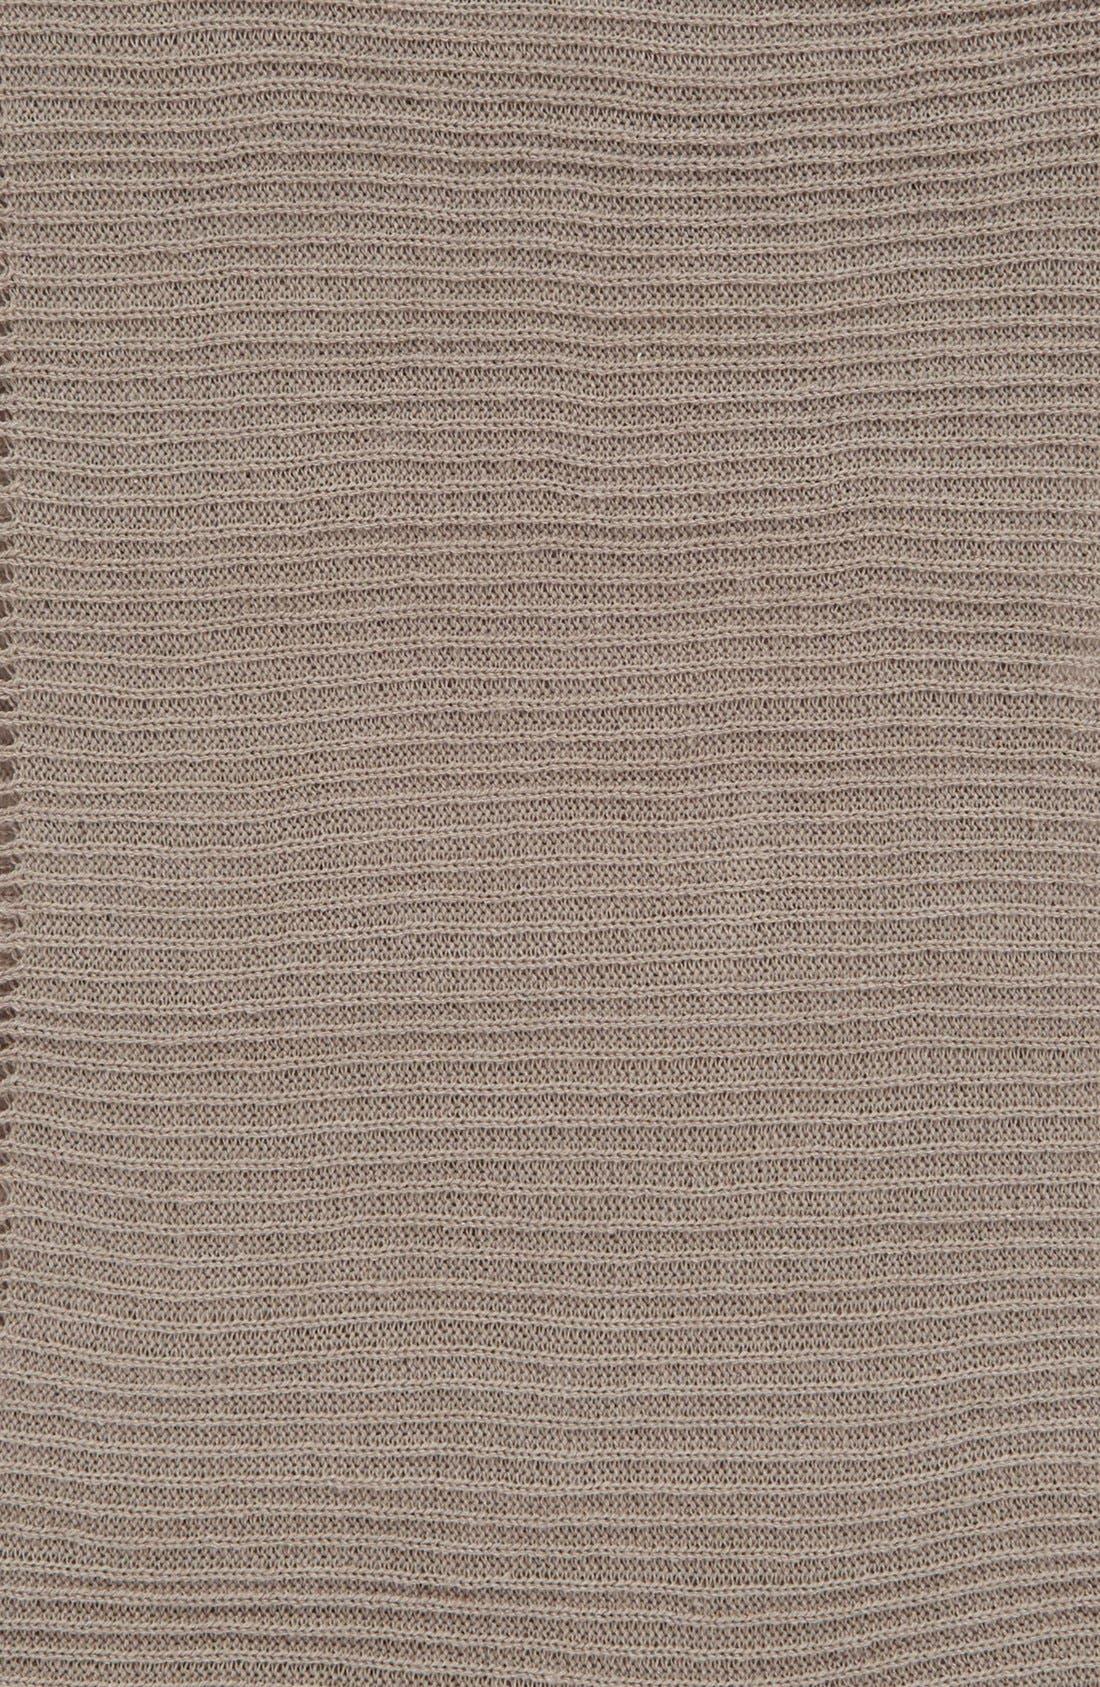 Rib Knit Fringe Infinity Scarf,                             Alternate thumbnail 8, color,